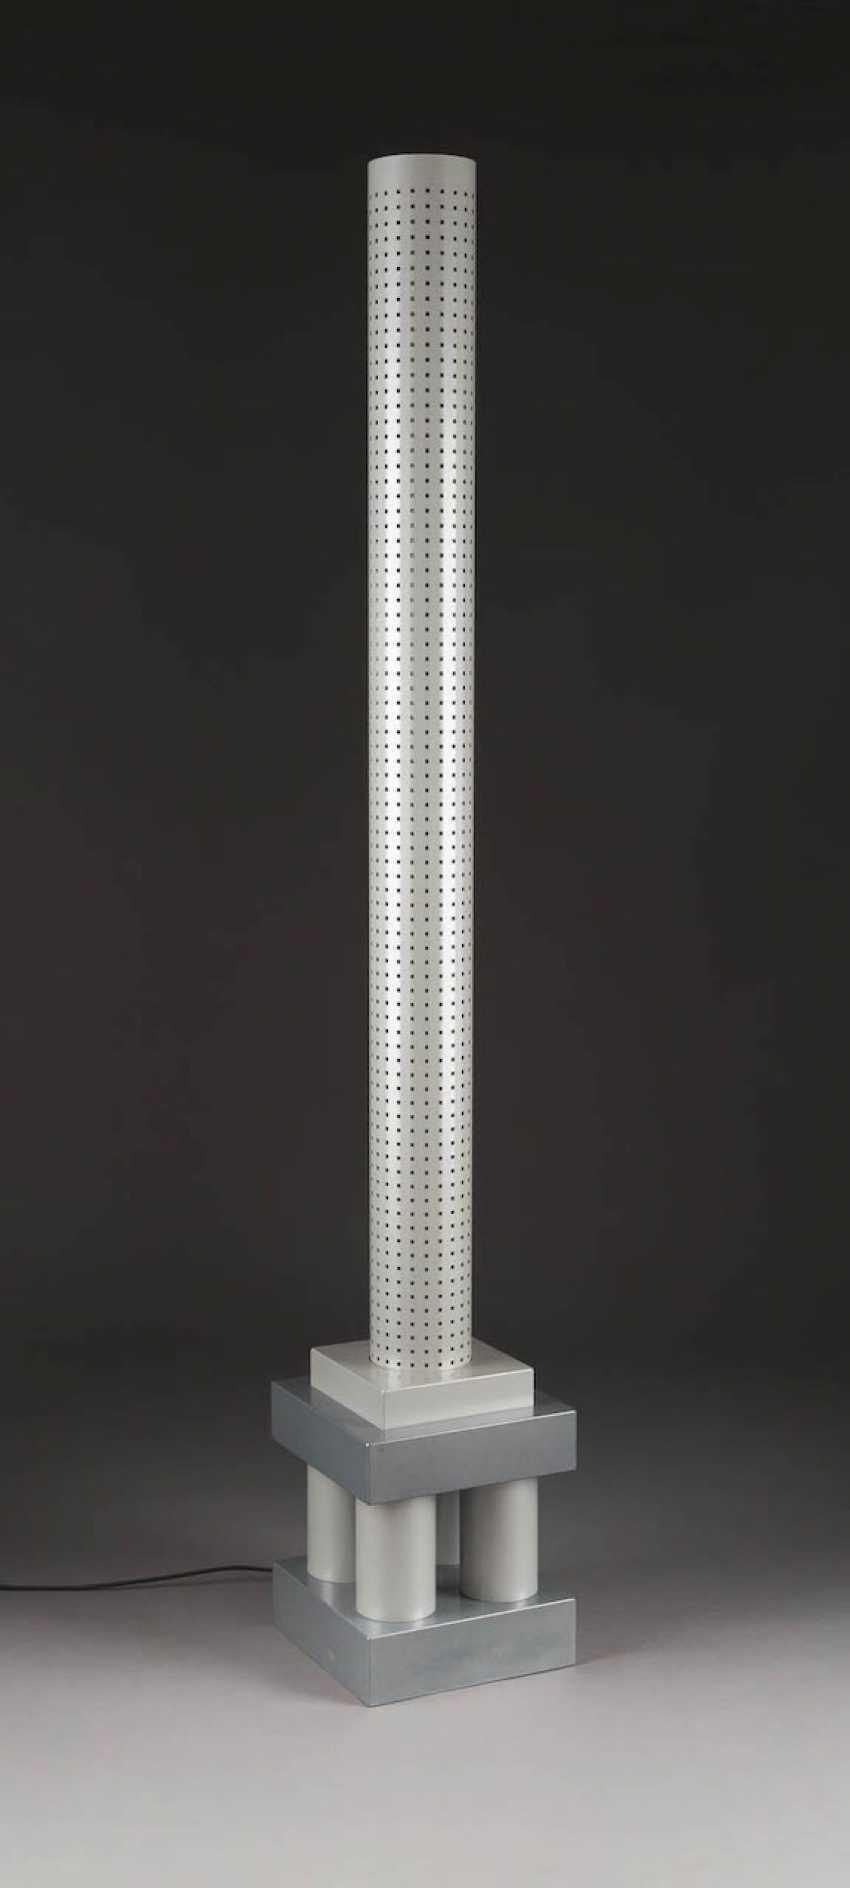 MATTEO THUN 1952 Bolzano (Italy). FLOOR LAMP 'CHICAGO TRIBUNE' (DRAFT 1985) - photo 1